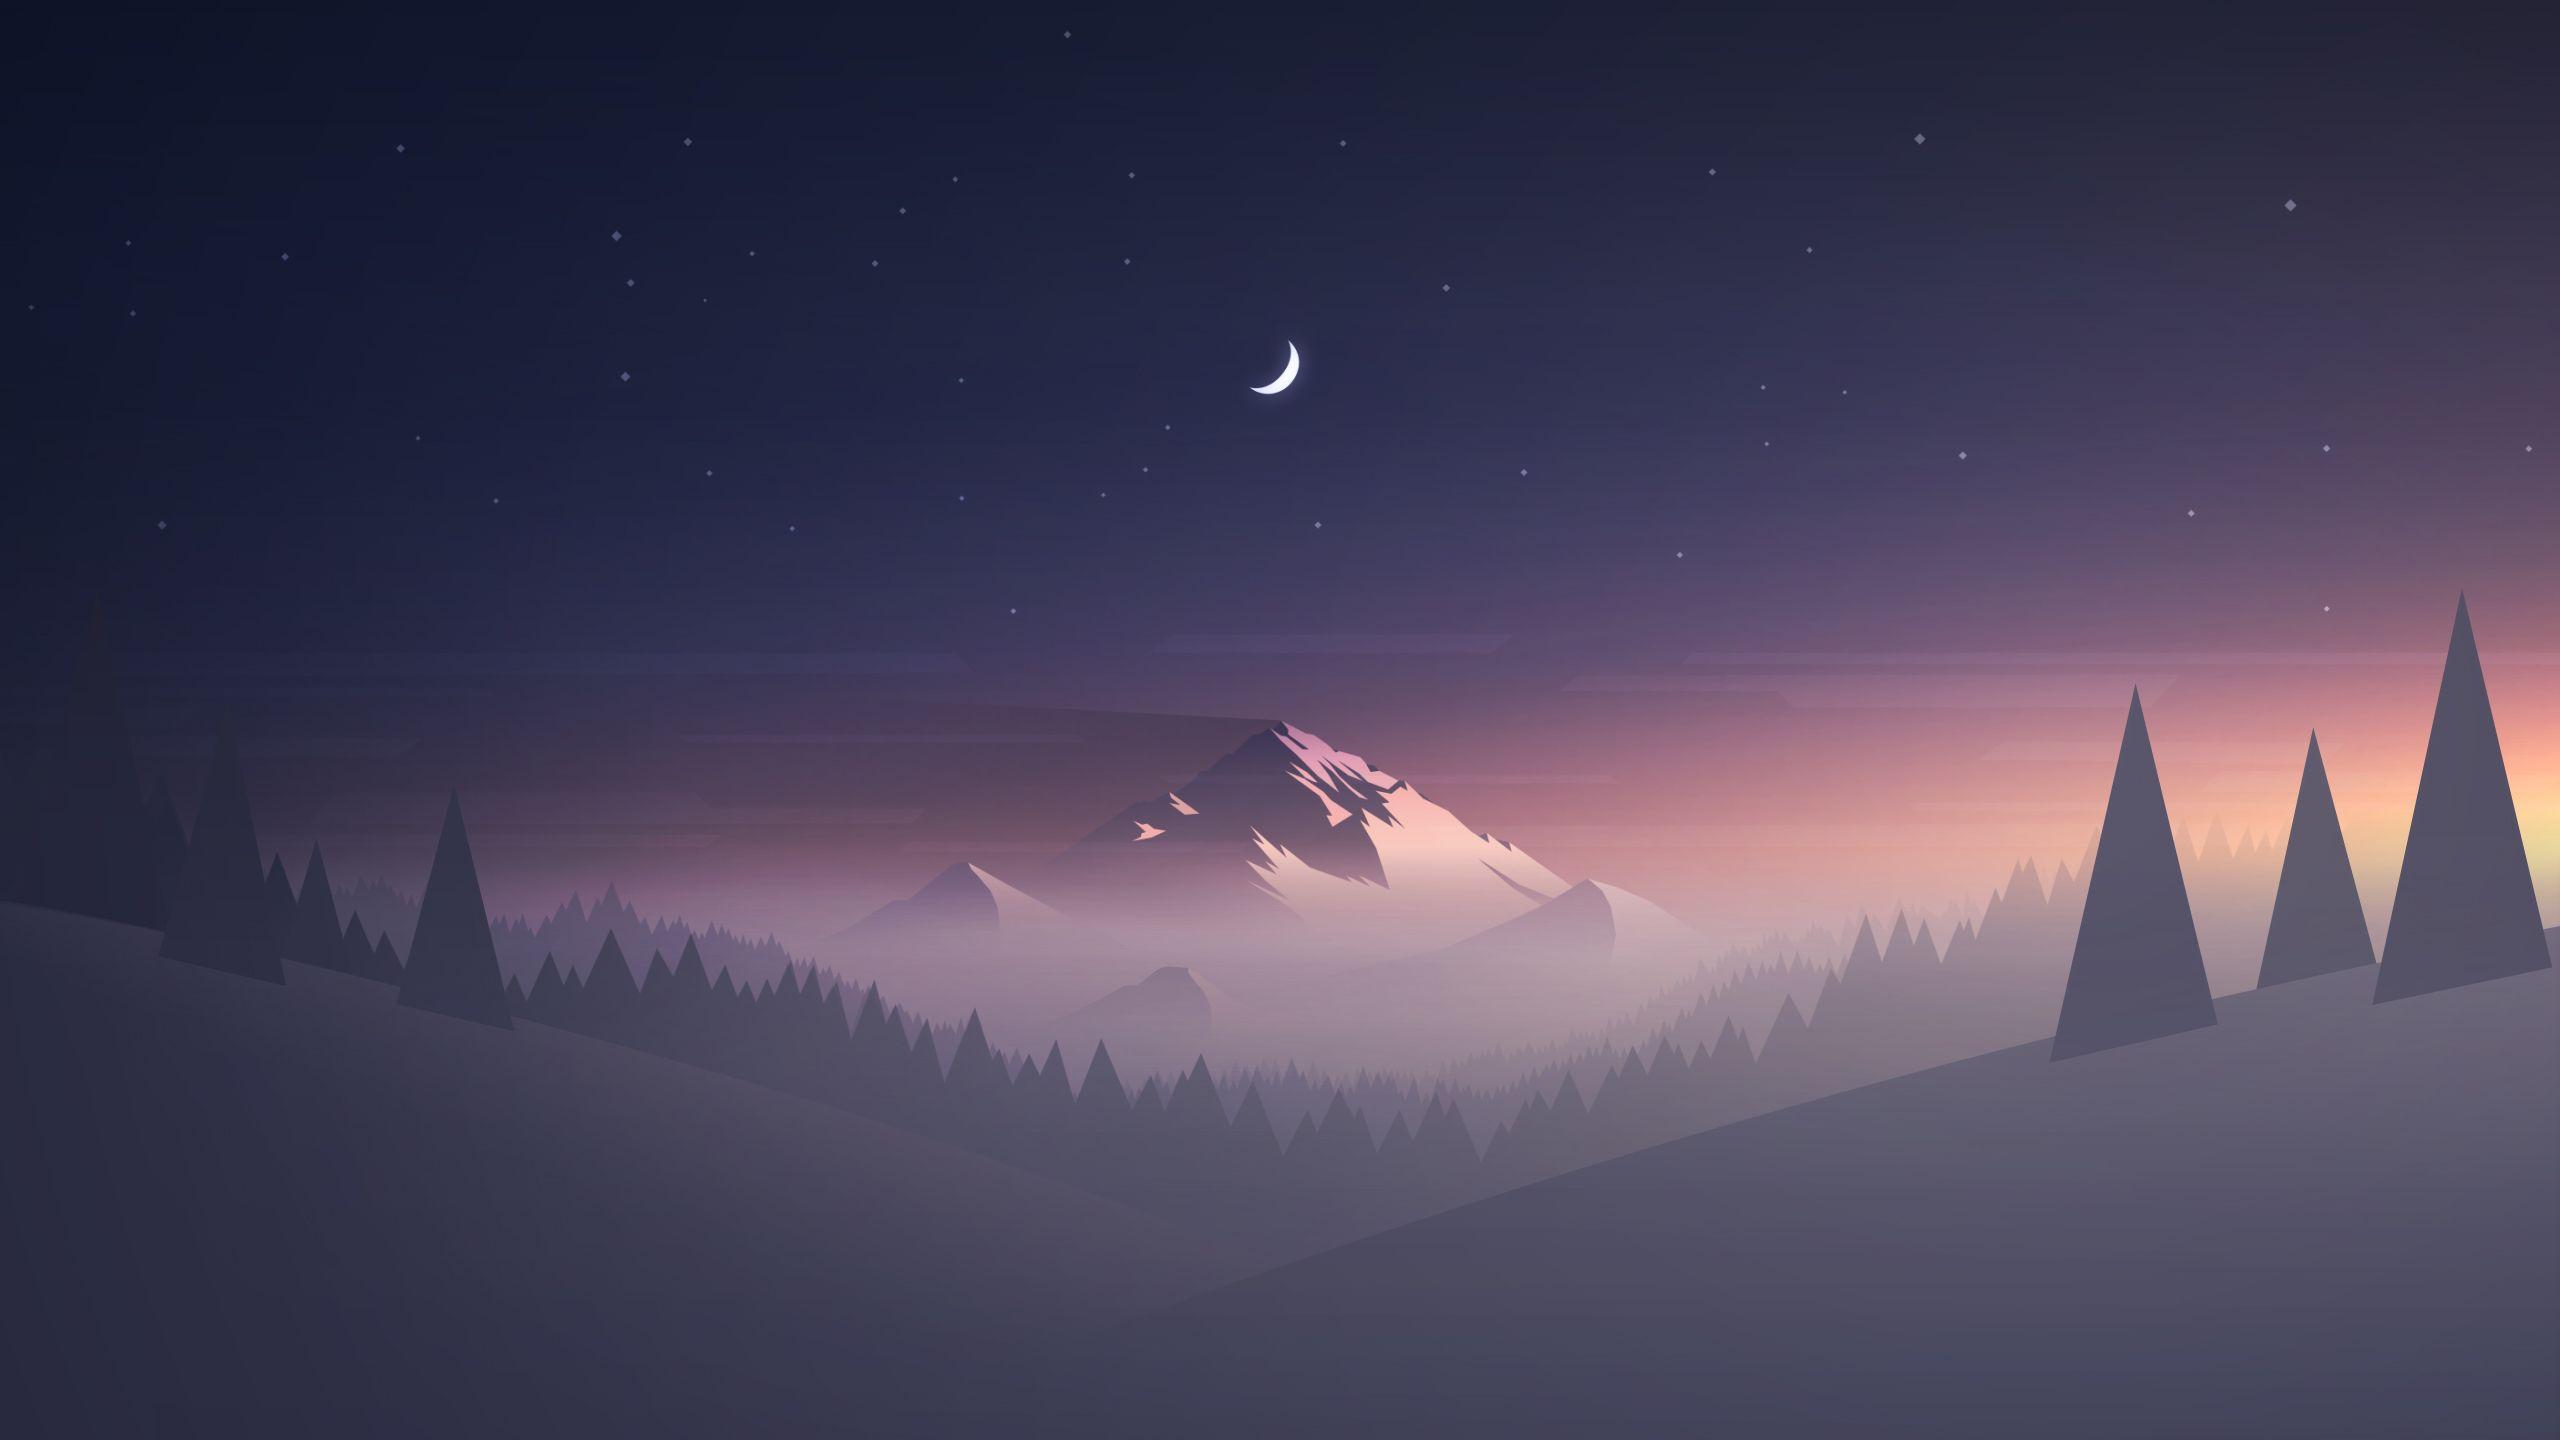 Mountain 2560x1440x Aesthetic Desktop Wallpaper Desktop Wallpaper Art Scenery Wallpaper